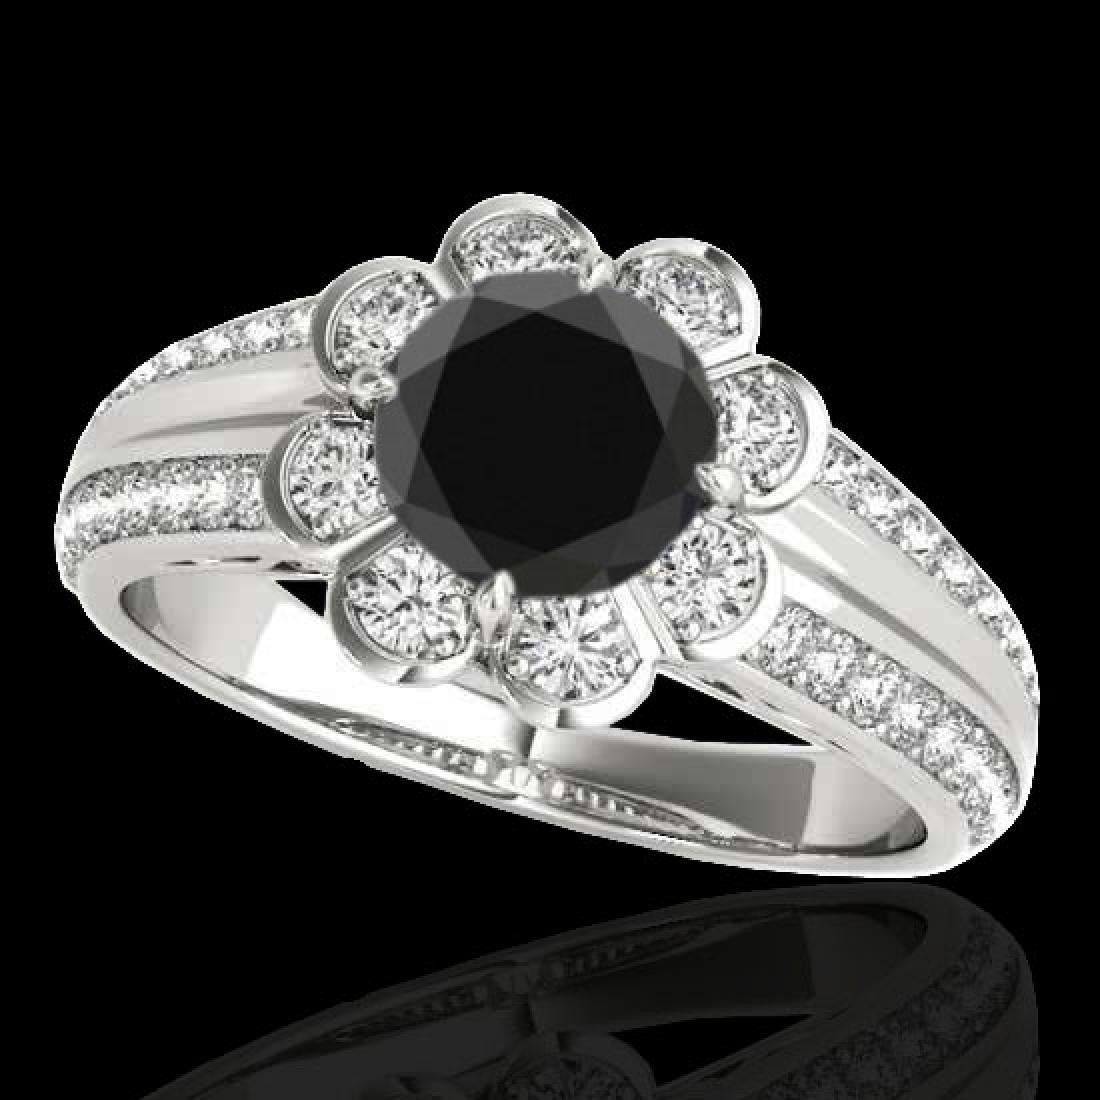 1.5 CTW Certified VS Black Diamond Solitaire Halo Ring